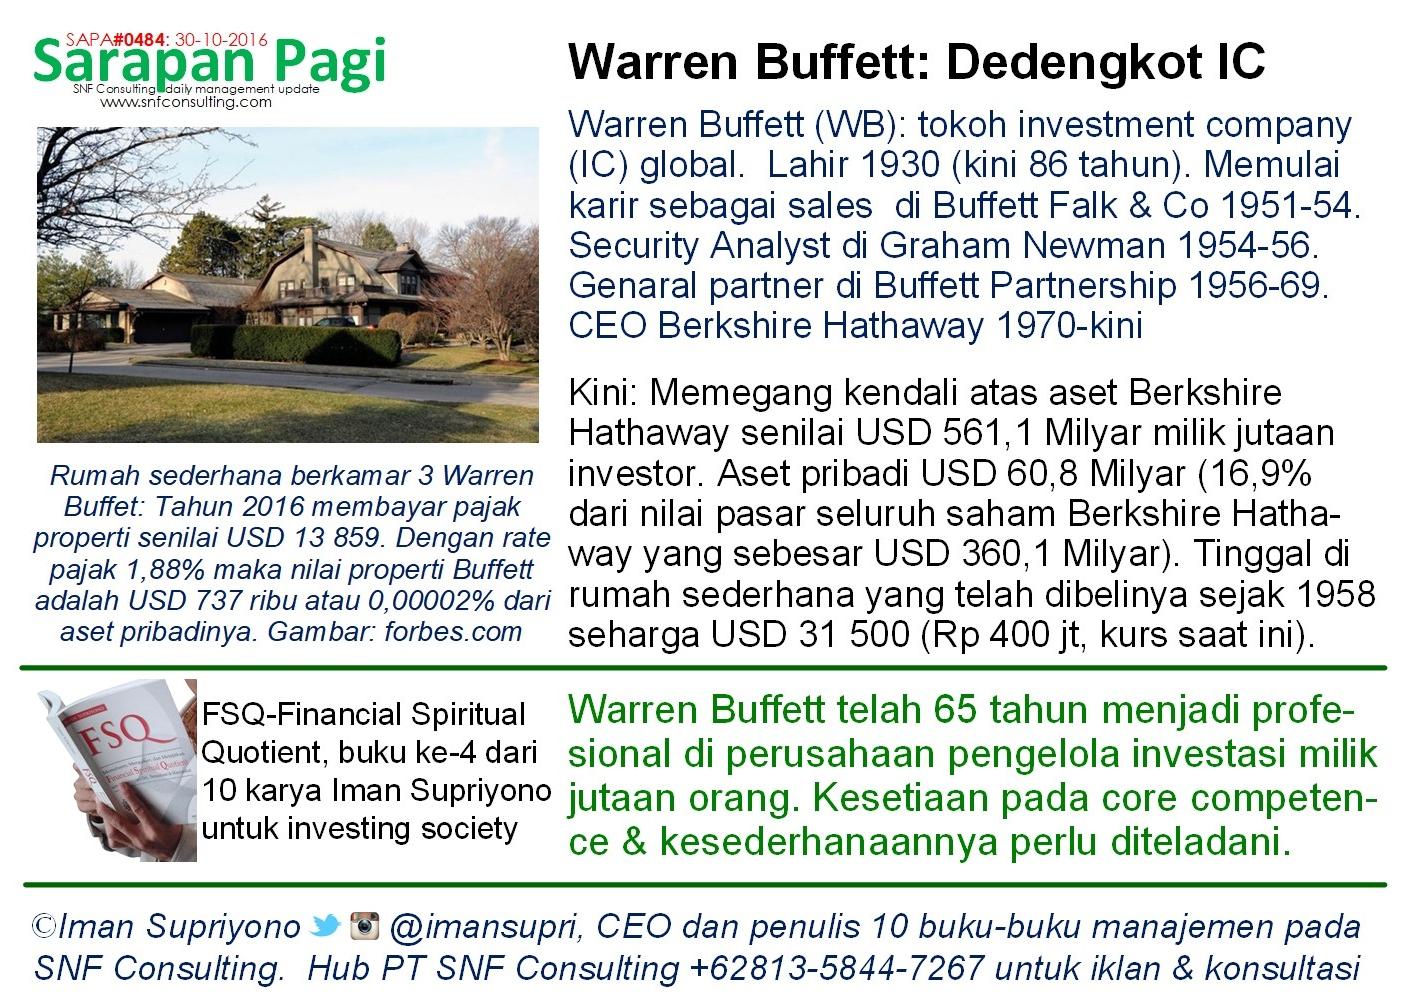 SAPA0484 Tokoh investment company Warren Buffet